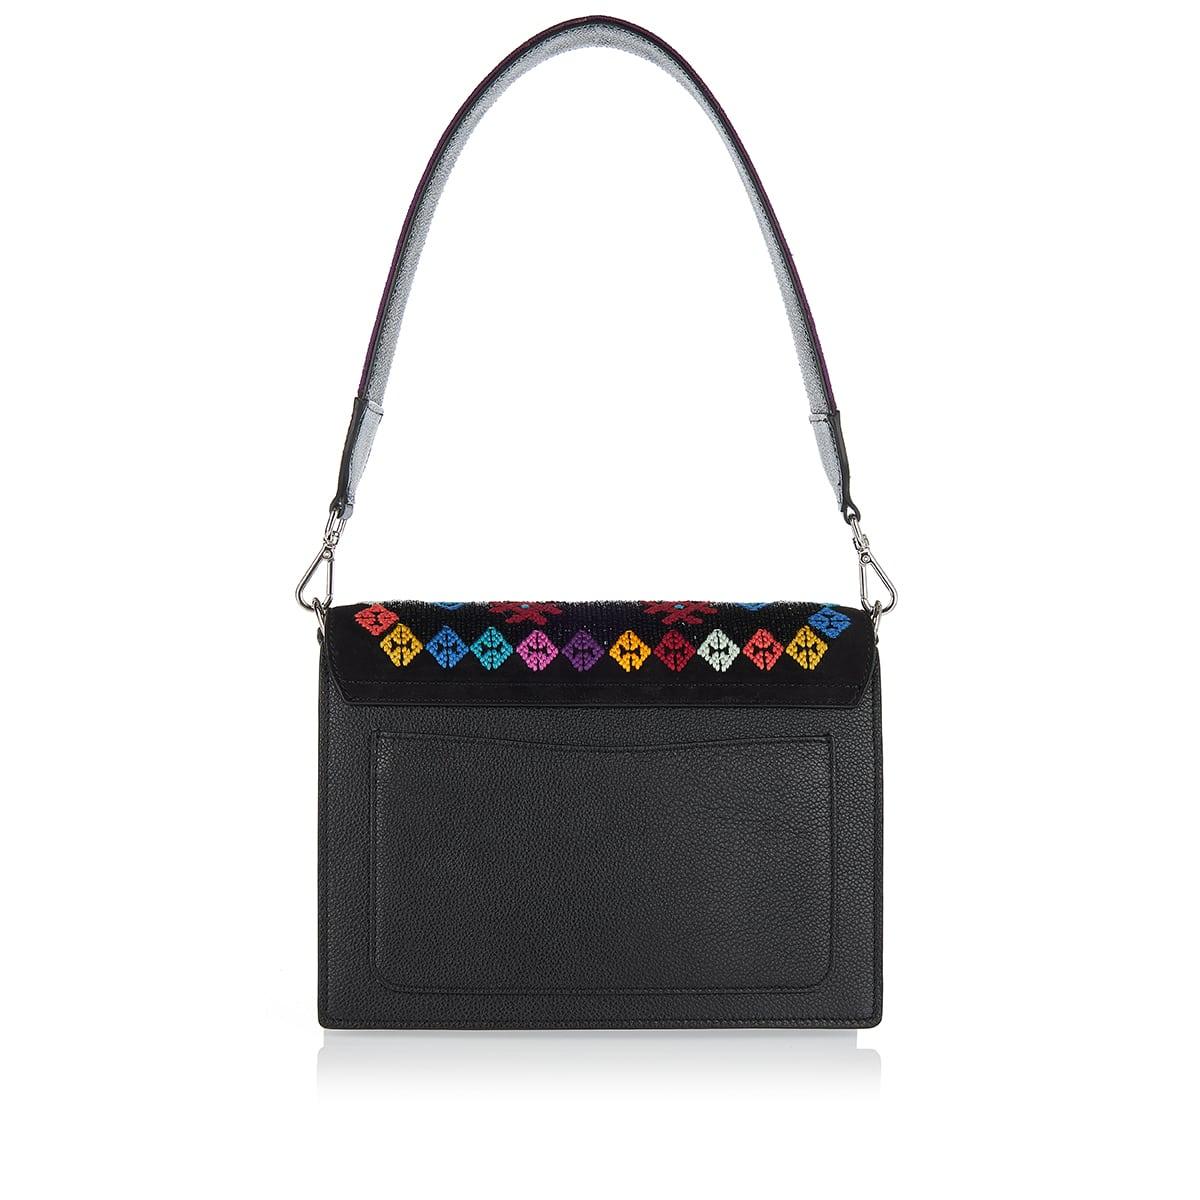 Rainbow bead embroidered shoulder bag